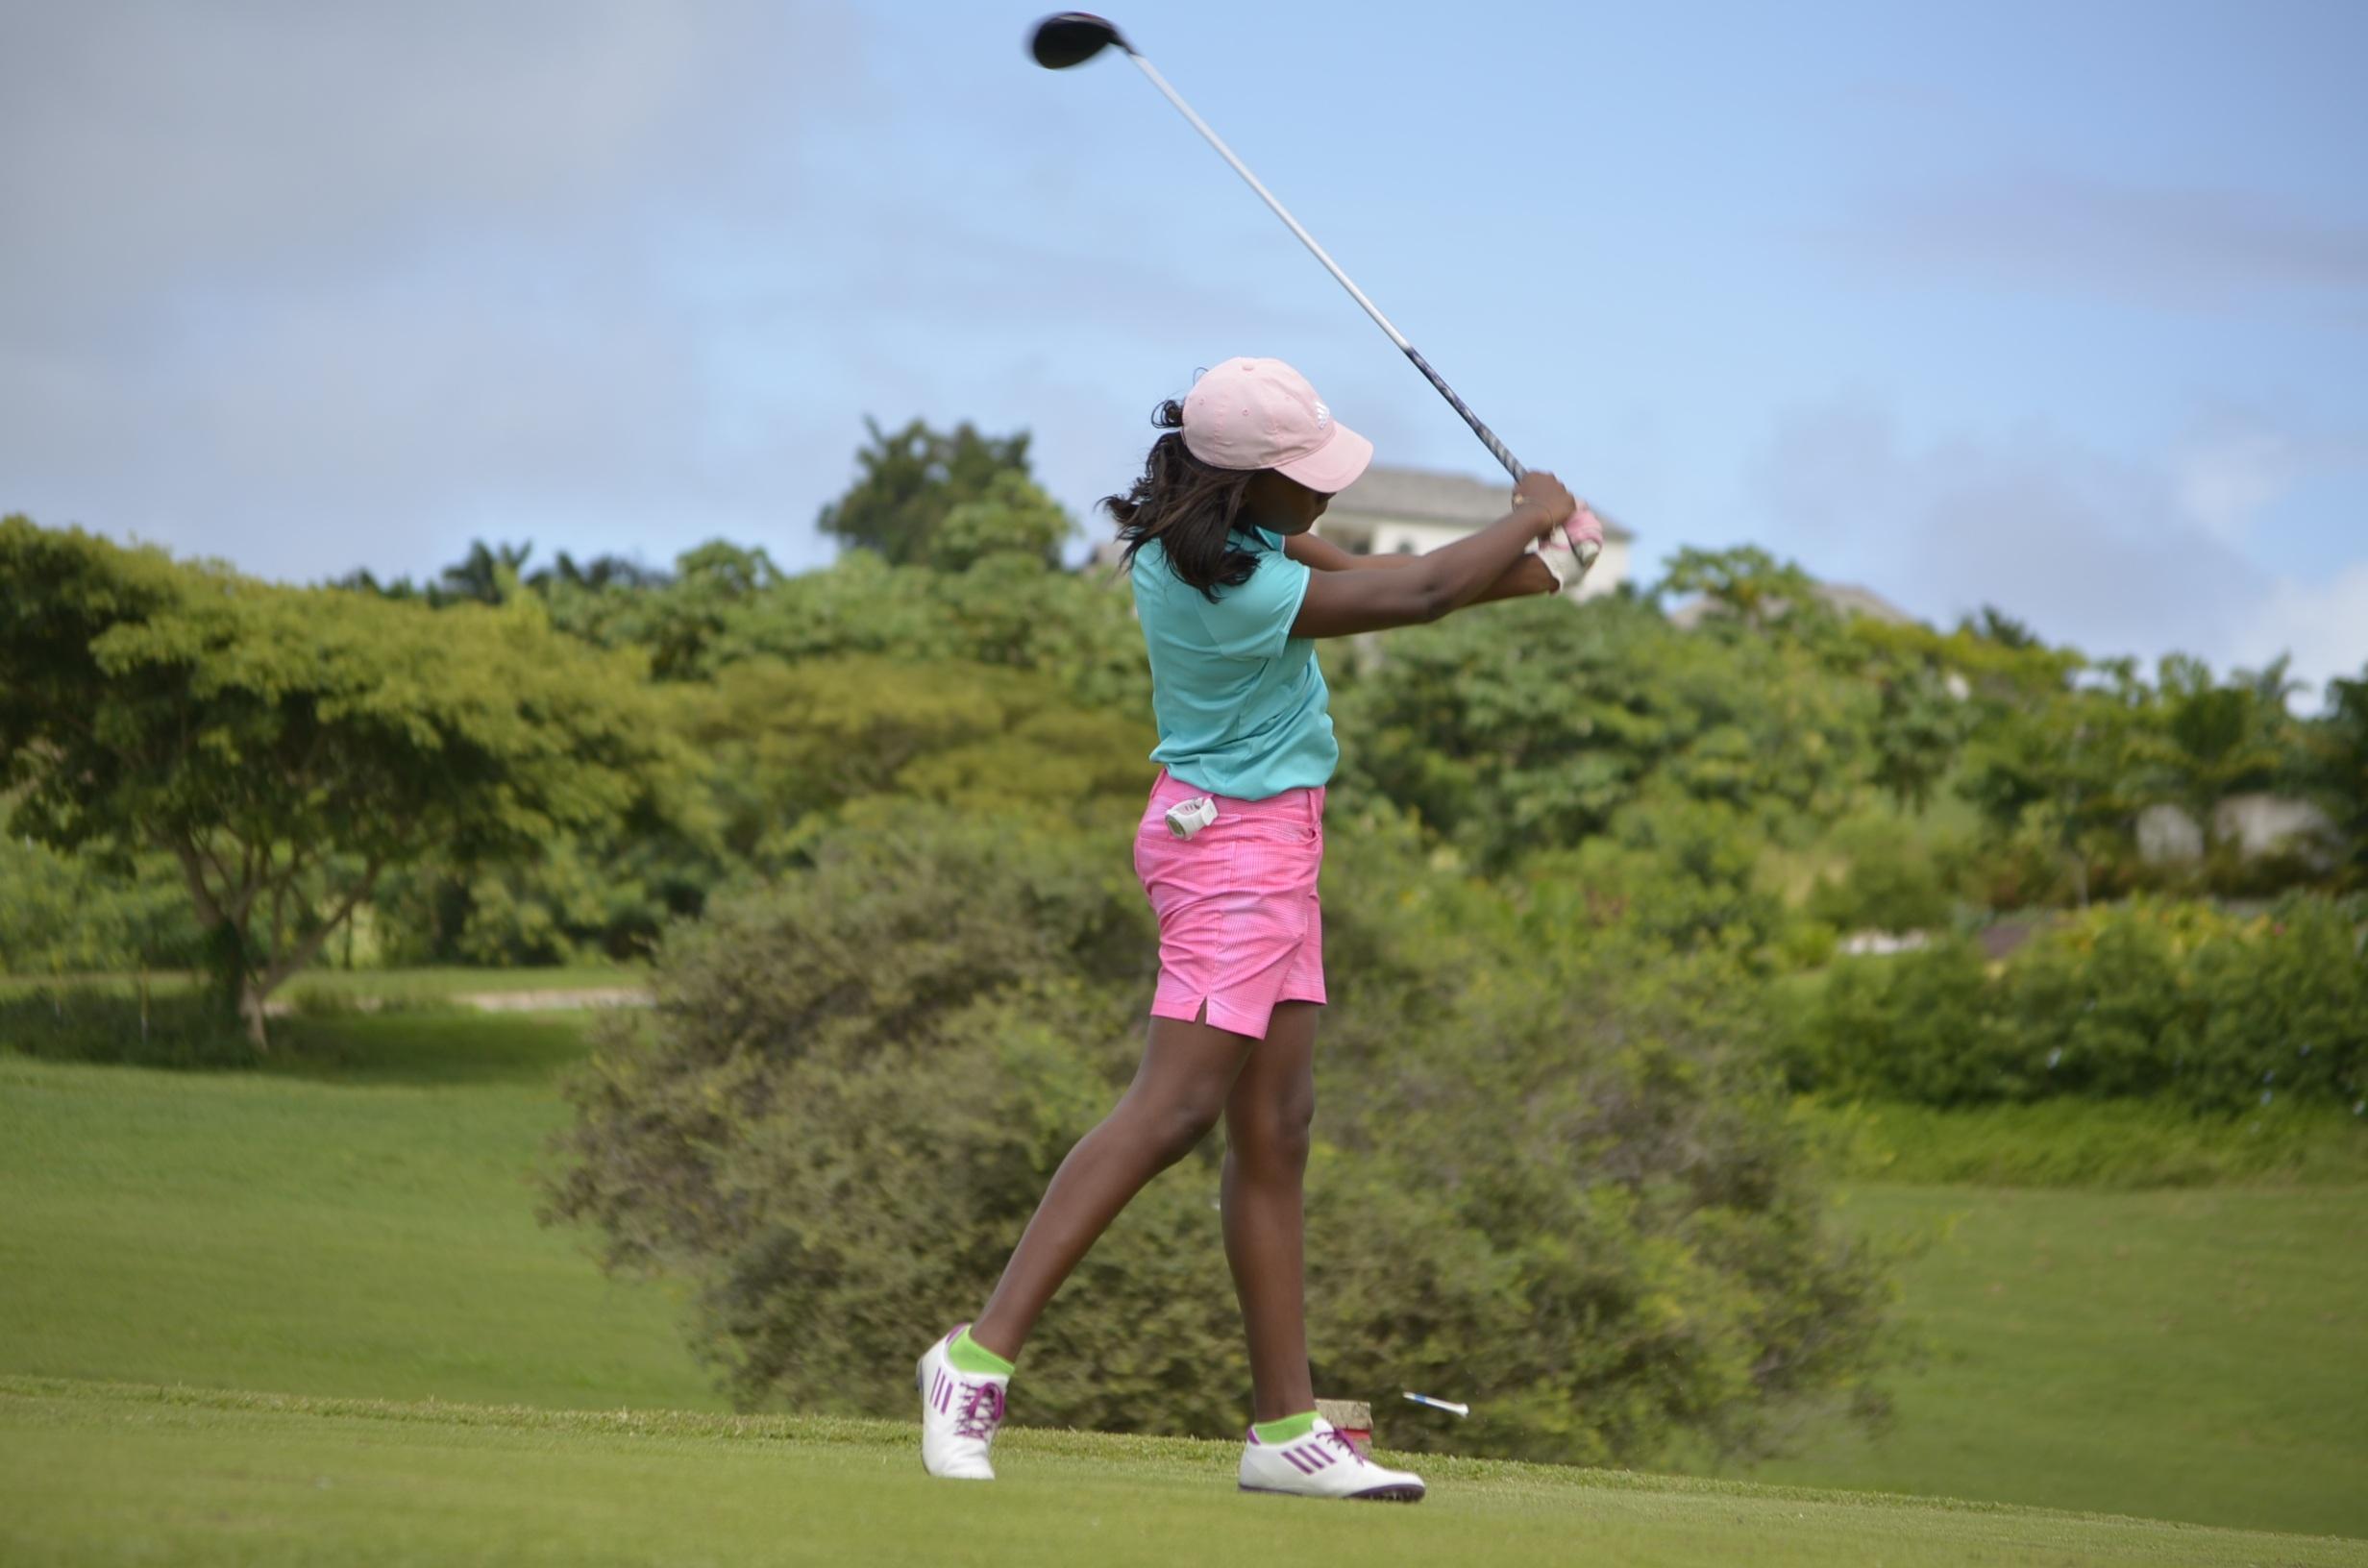 golf-barbados-sport-course-163321.jpg